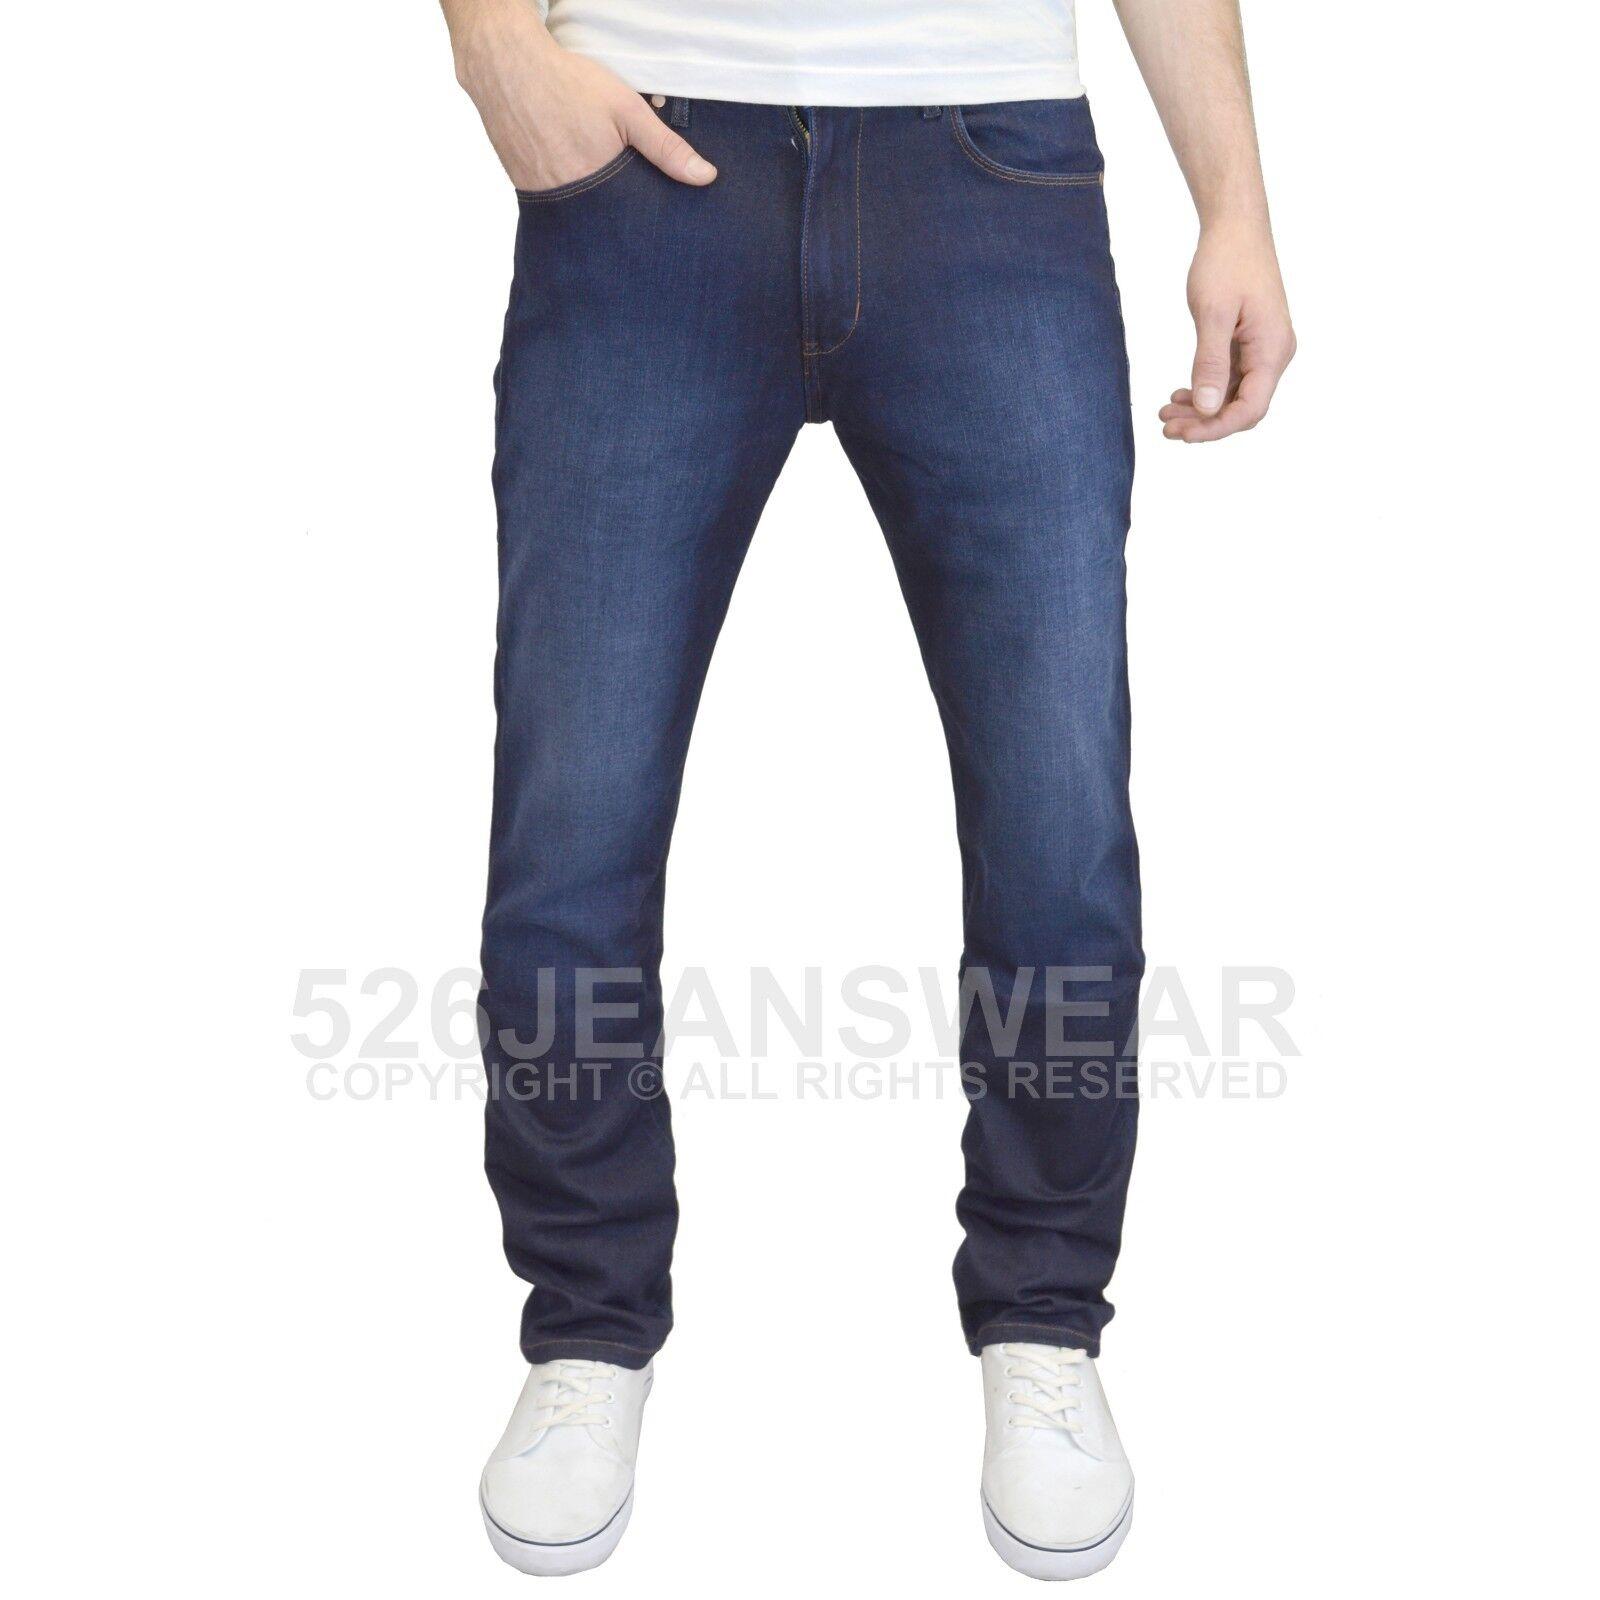 fc677781b83fa Men s Arizona Luxe bluee Stroke Stretch Regular Fit Jeans Wrangler Soft  nfhxiy5034-Jeans